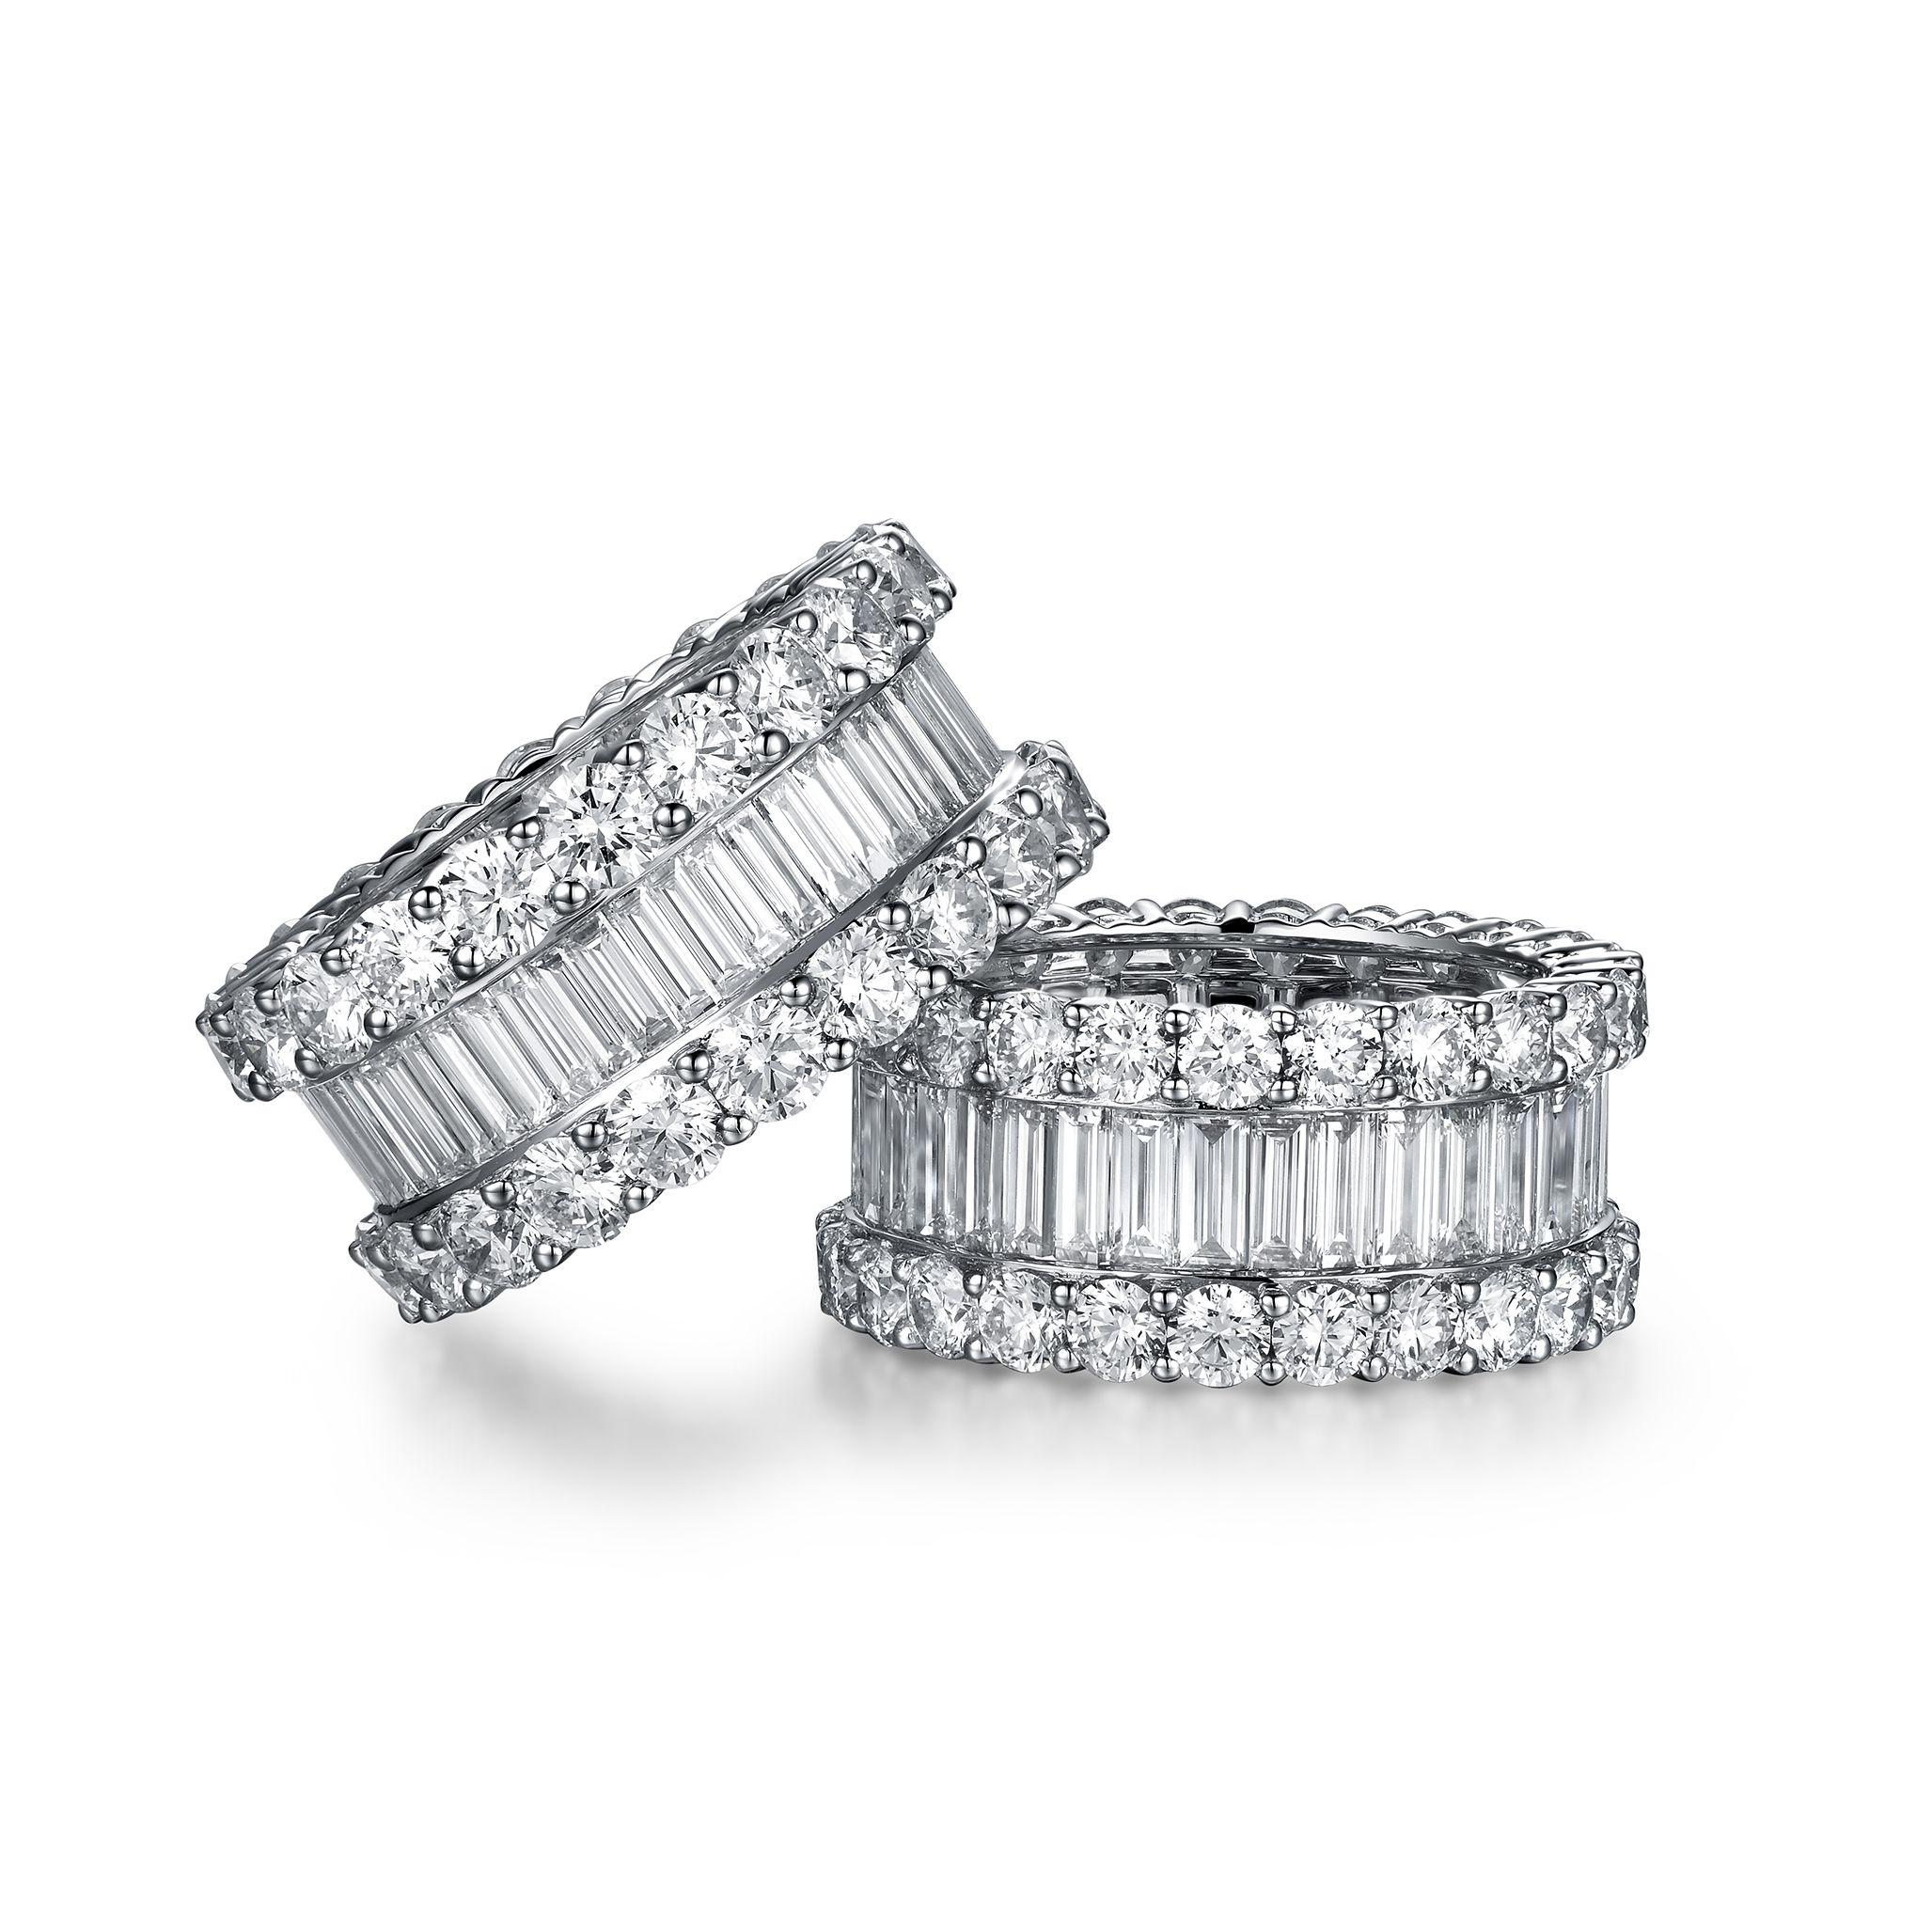 Noble Jewelry Ltd Booth B FineJewelry JCK